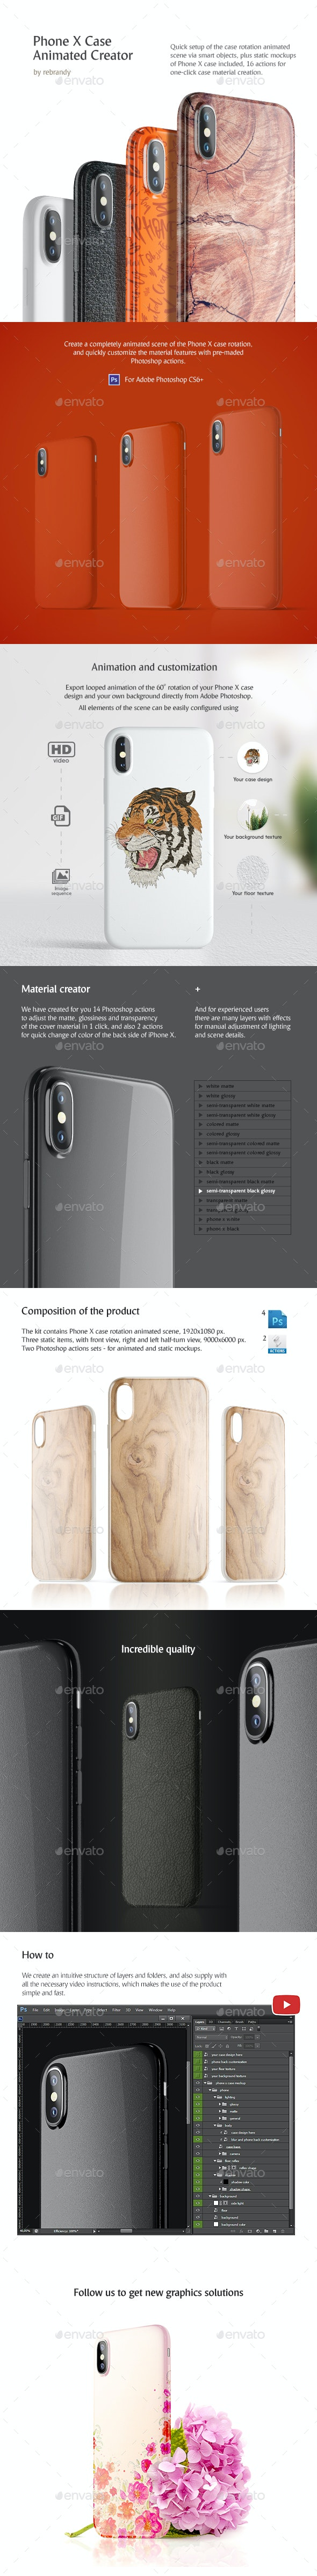 Phone X Case Animated Creator - Mobile Displays